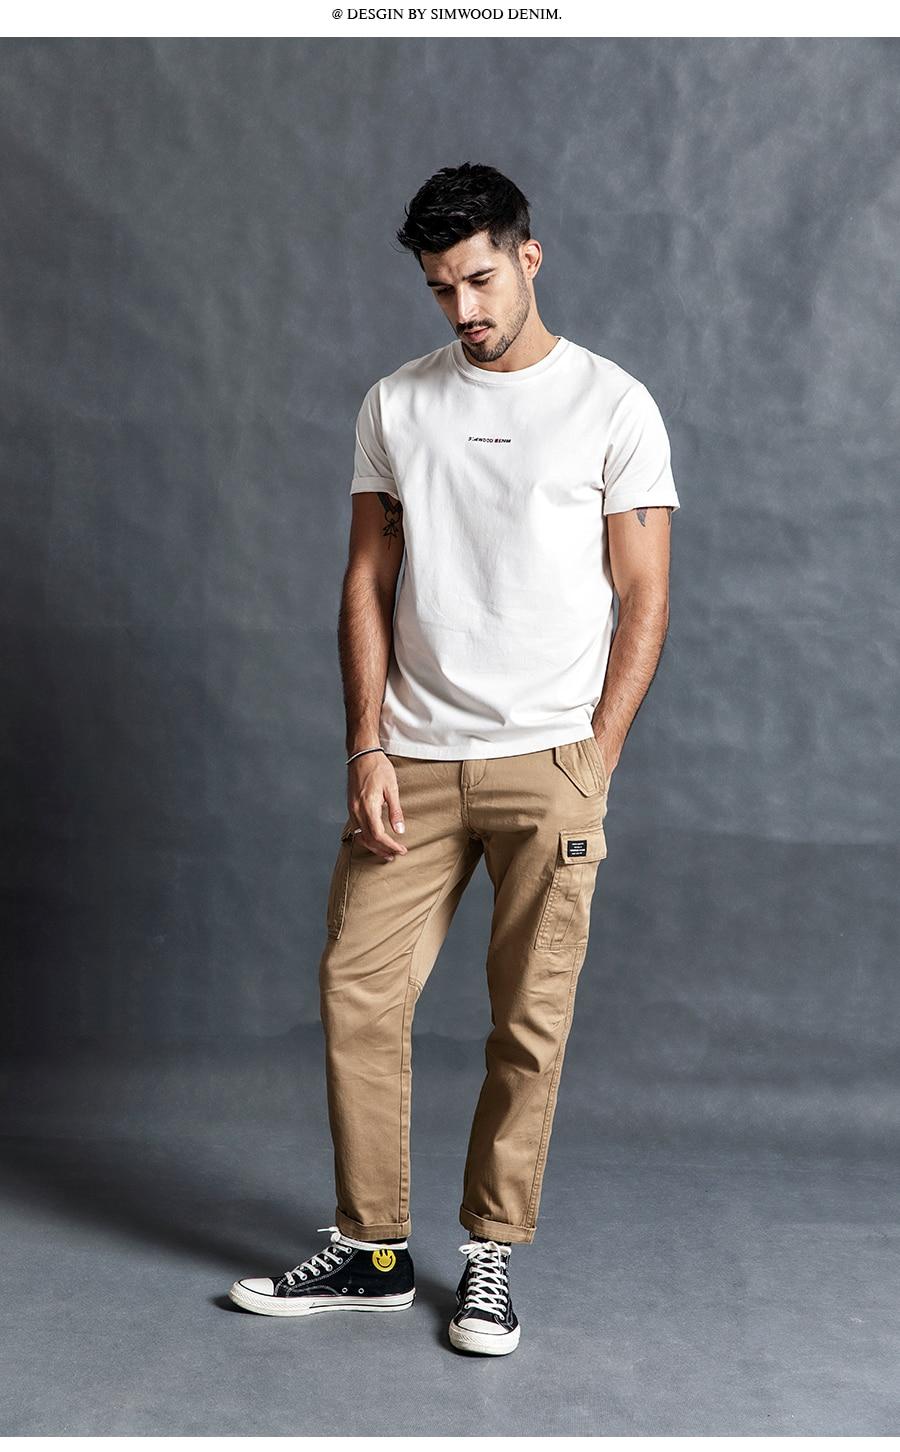 H325ab2b8cffd401a88a7b6ec3363ac51z SIMWOOD New 2019 Casual Pants Men Fashion track Cargo Pants Ankle-Length military autumn Trousers Men pantalon hombre 180614